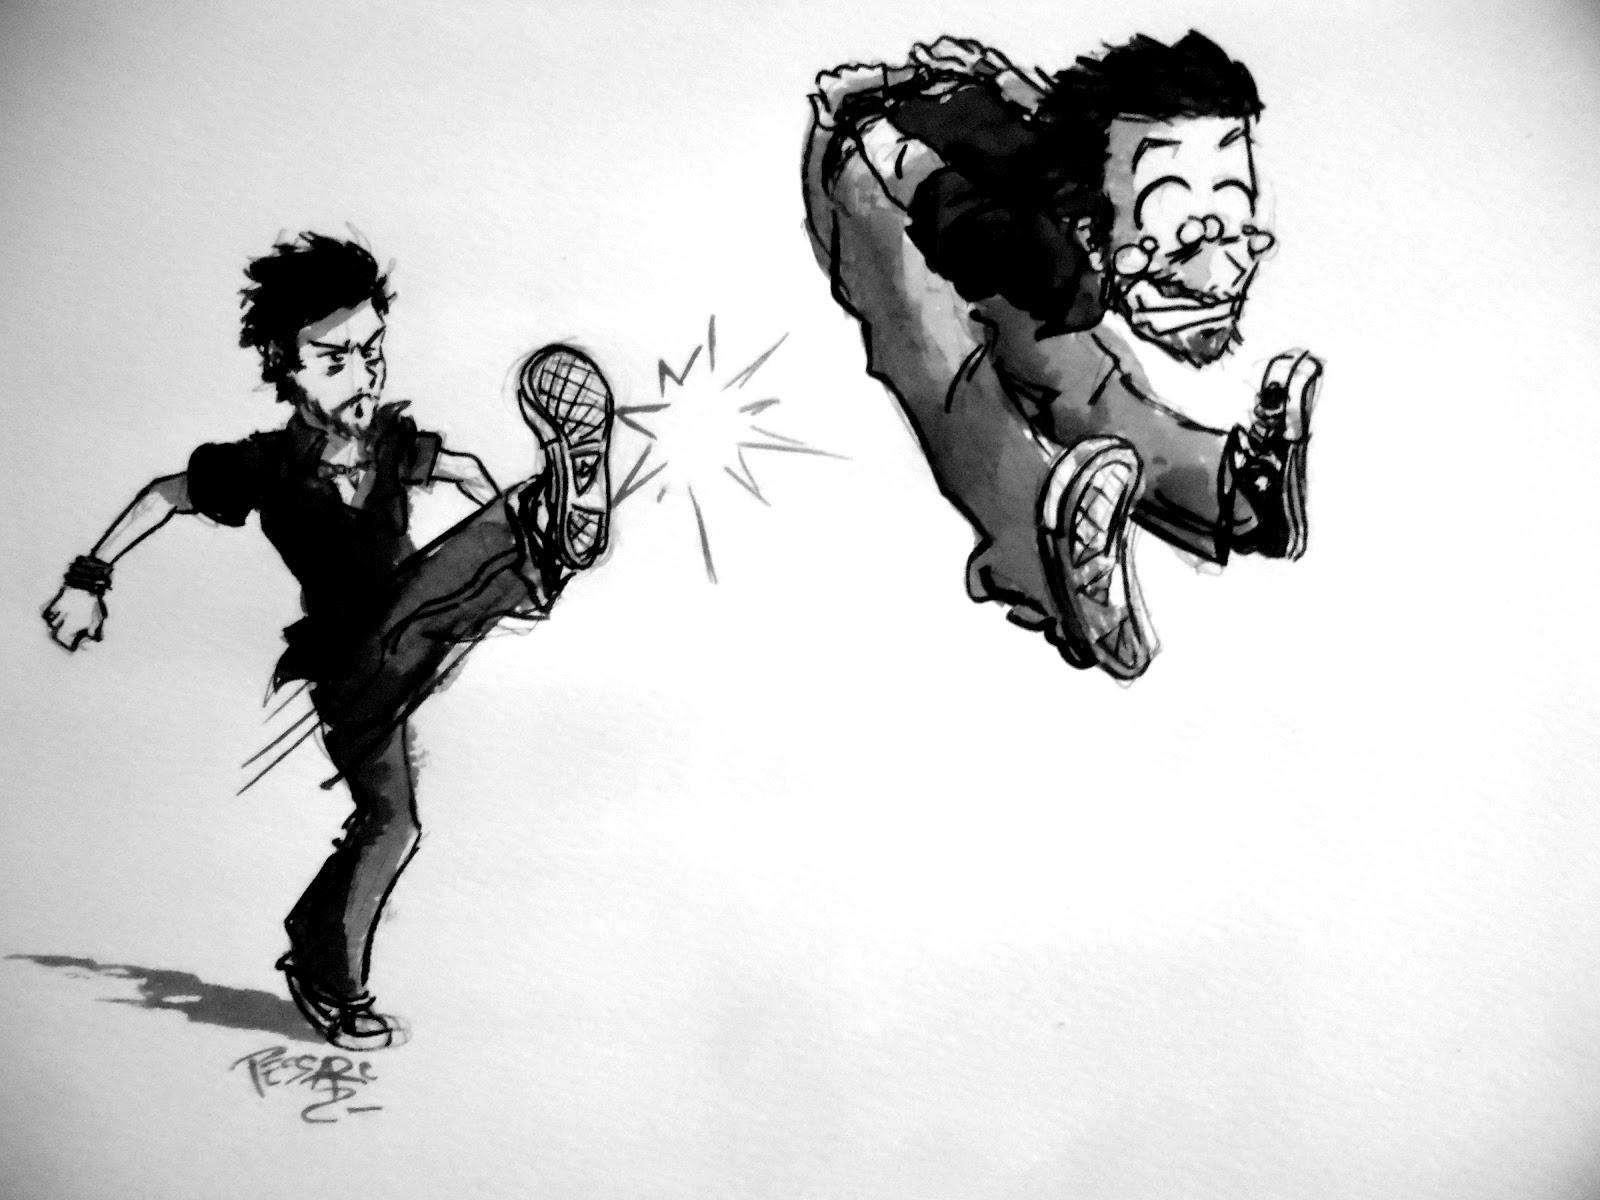 Kick+the+moody.JPG